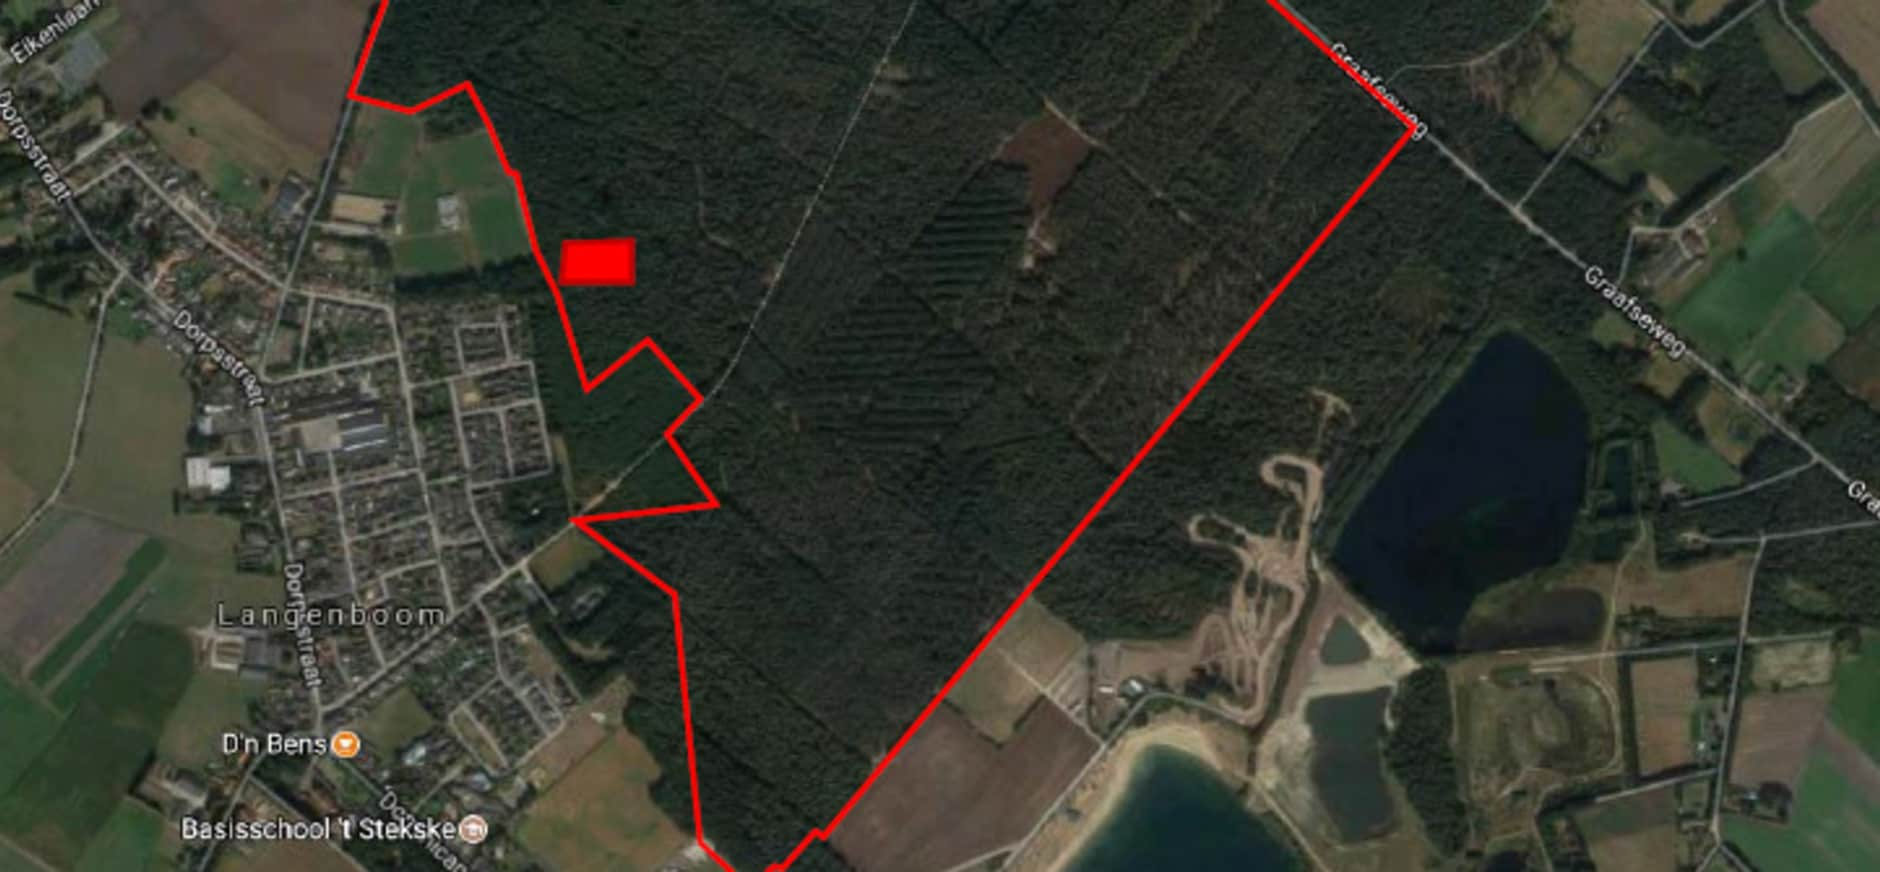 Start bodemsanering Langenboomse bossen